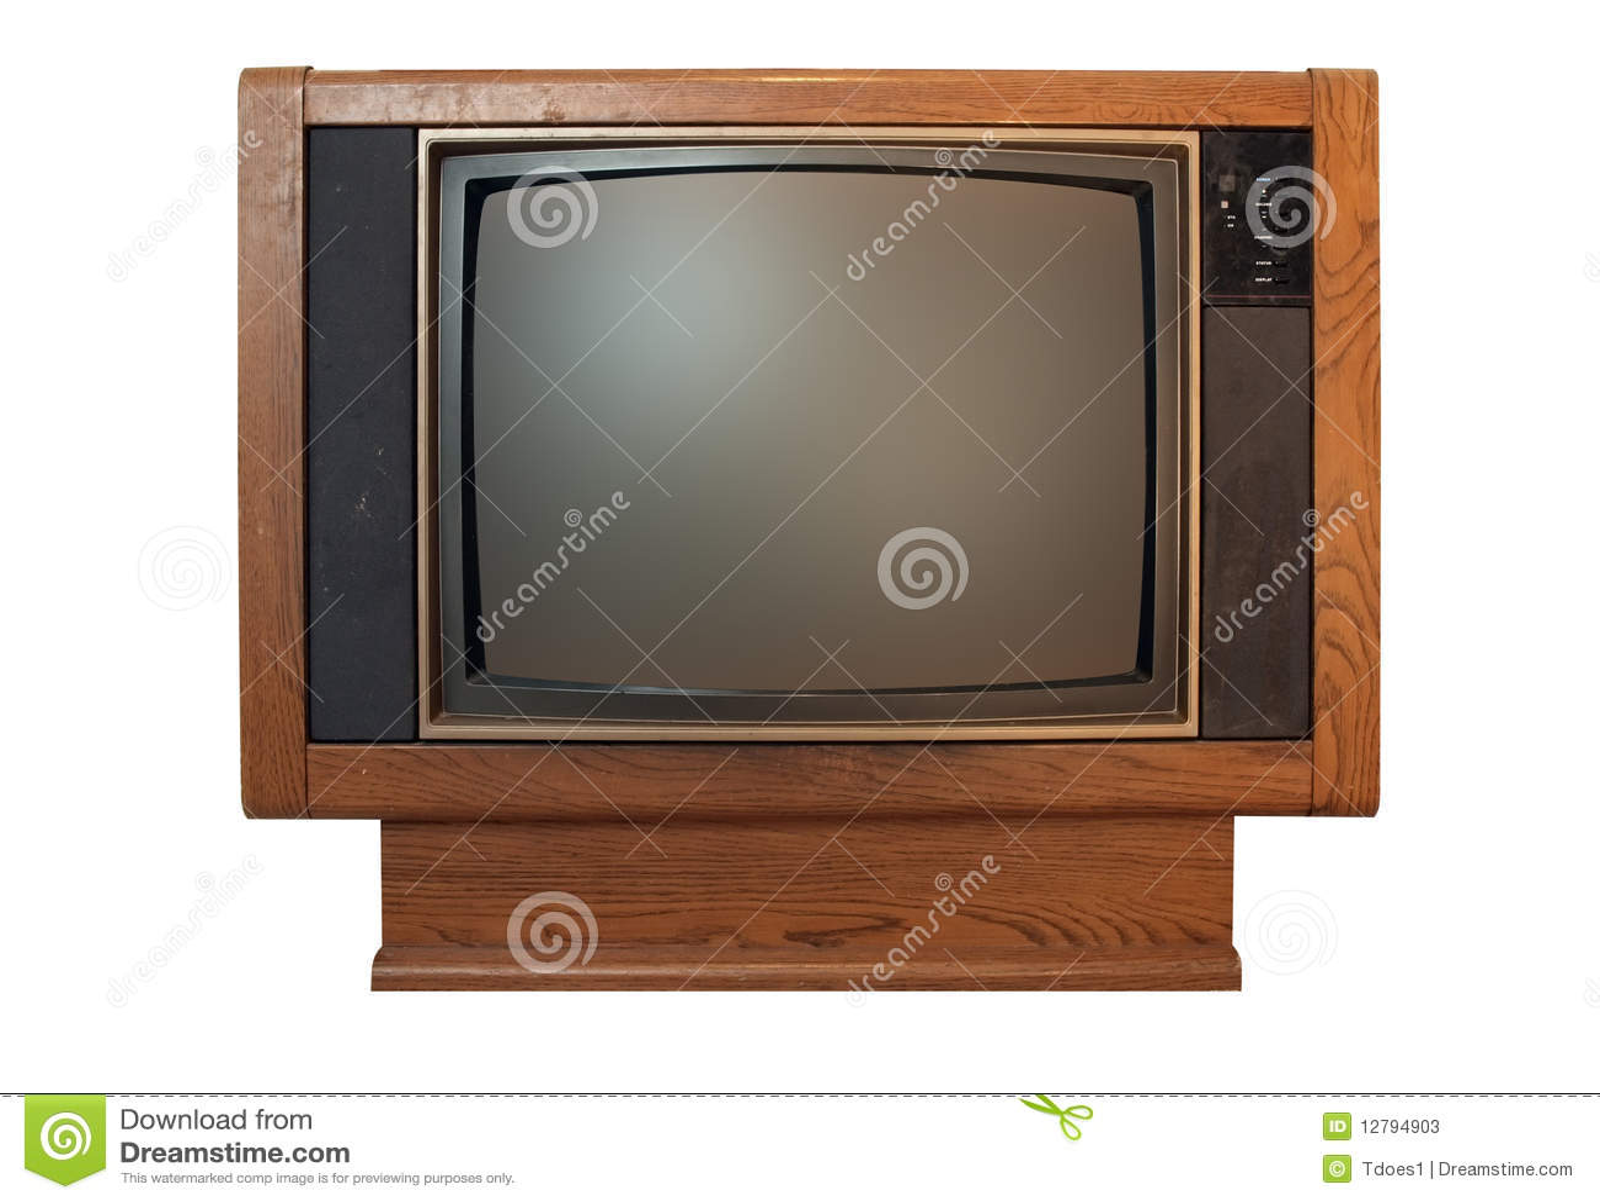 Television vintage floor model stock photos image for Floor model tv